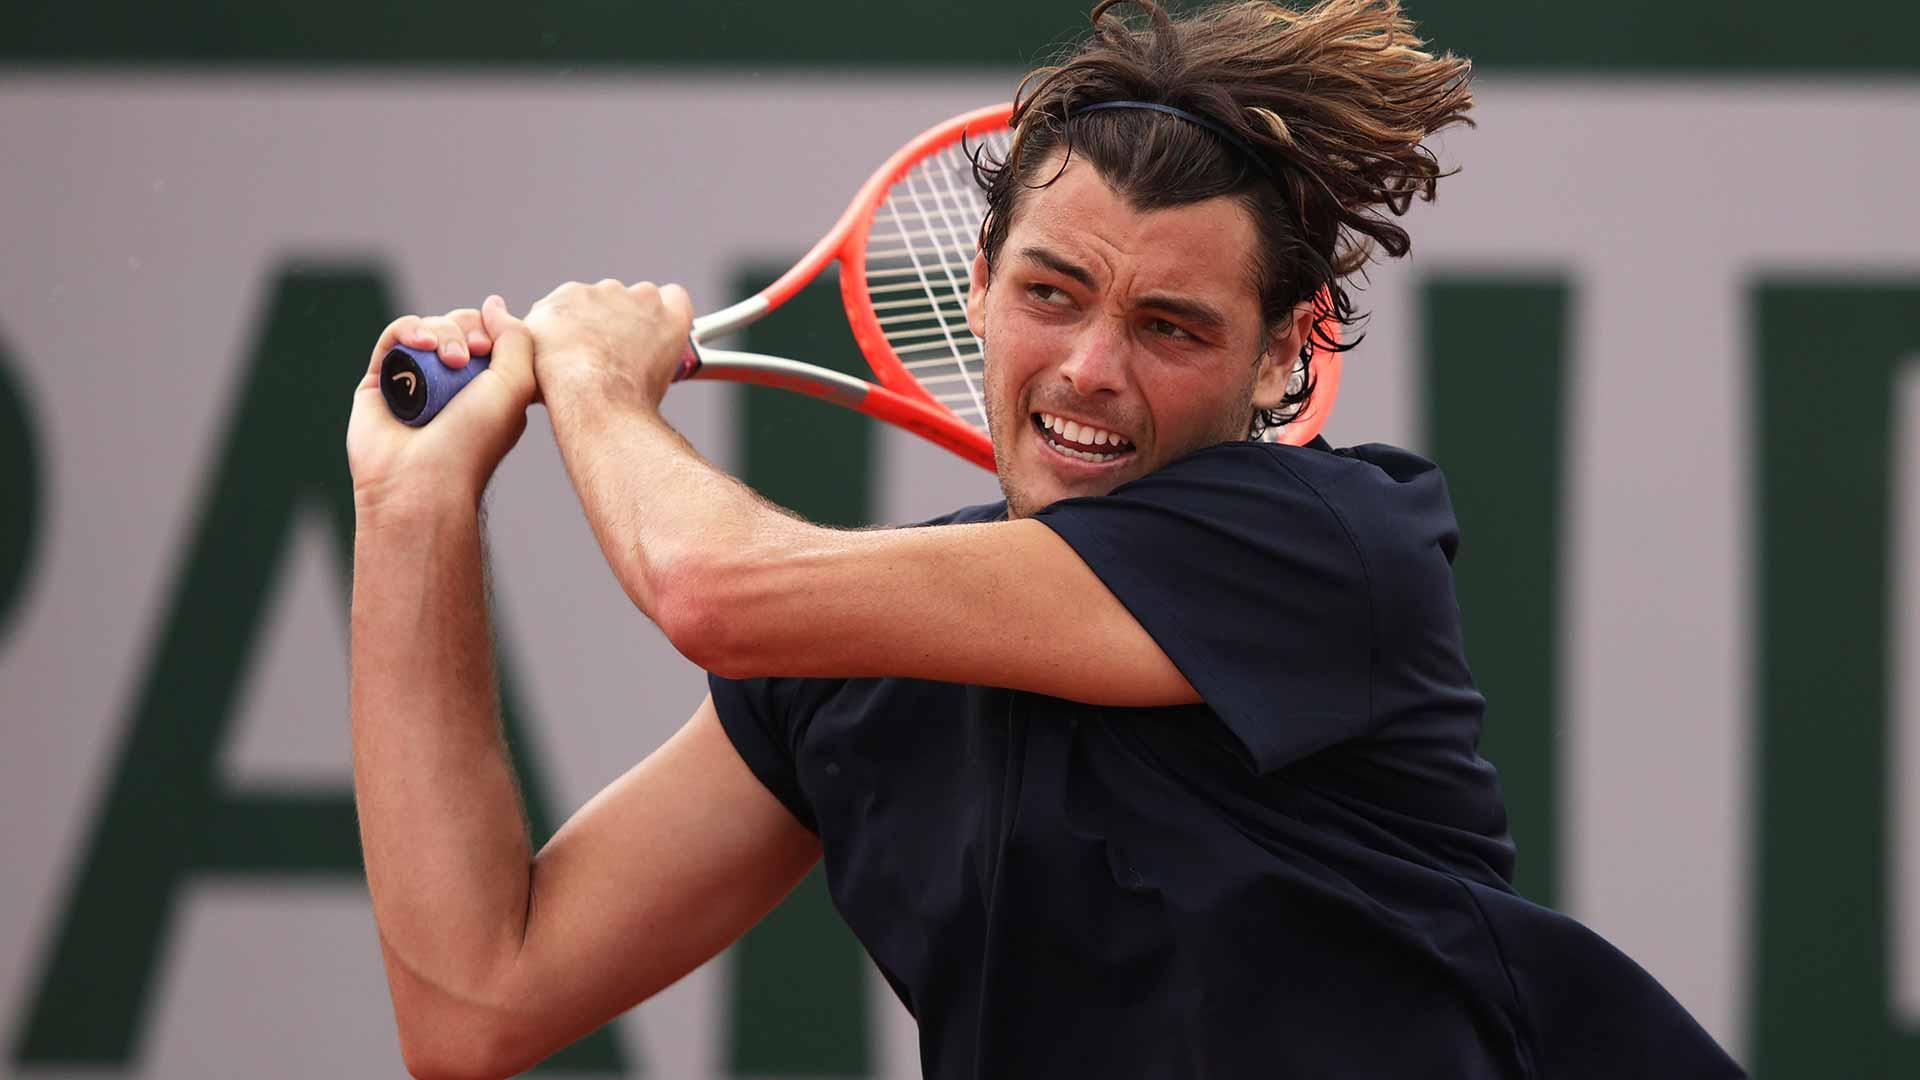 Los Cabos Open 2021: Taylor Fritz vs. Illya Marchenko Tennis Pick and Prediction